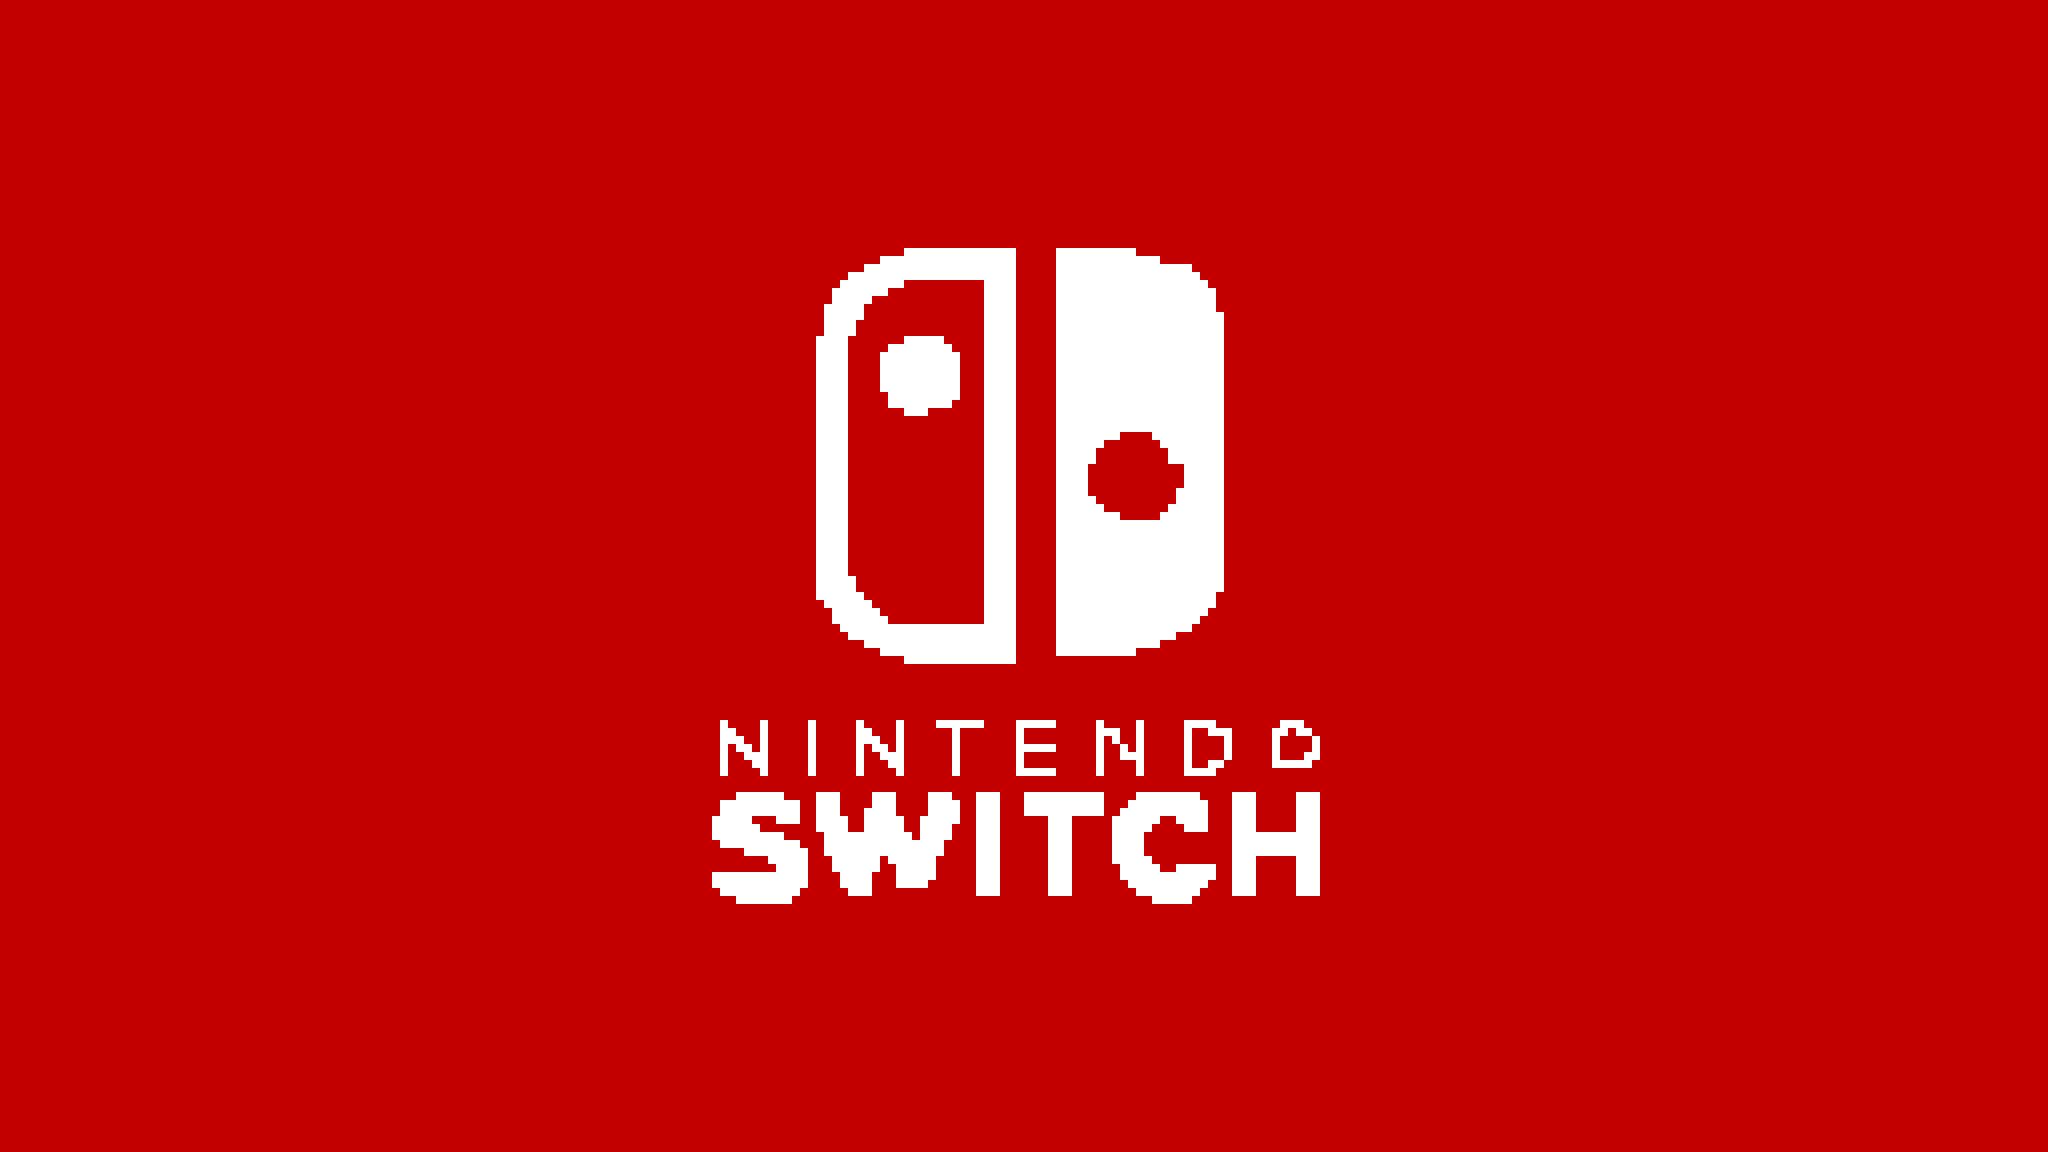 Nintedndo Switch